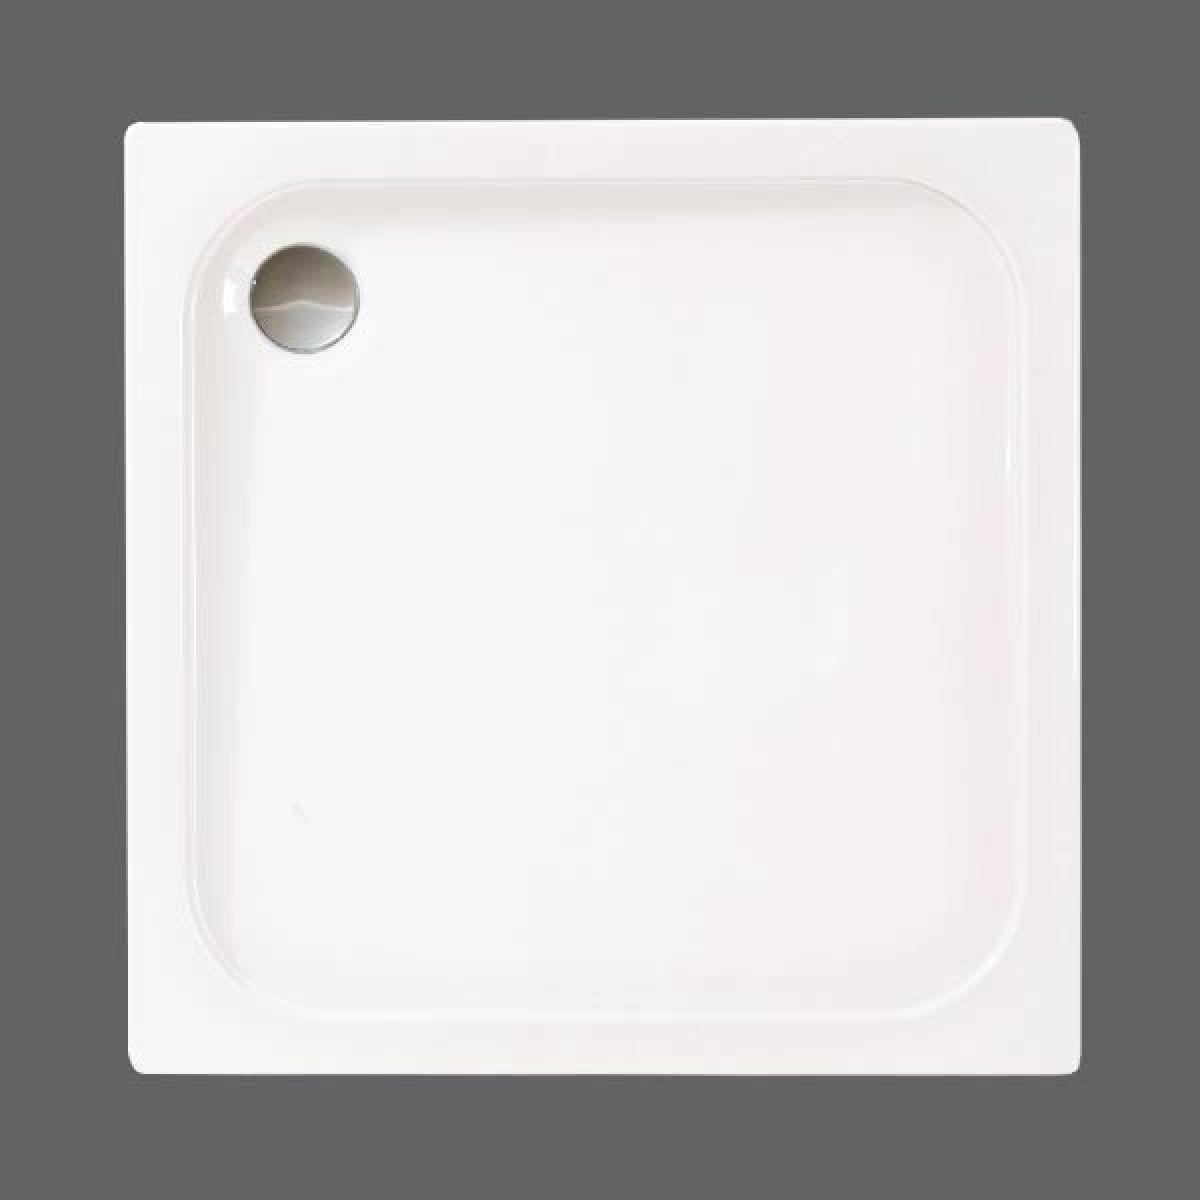 Merlyn MStone Square Shower Tray 800 x 800mm